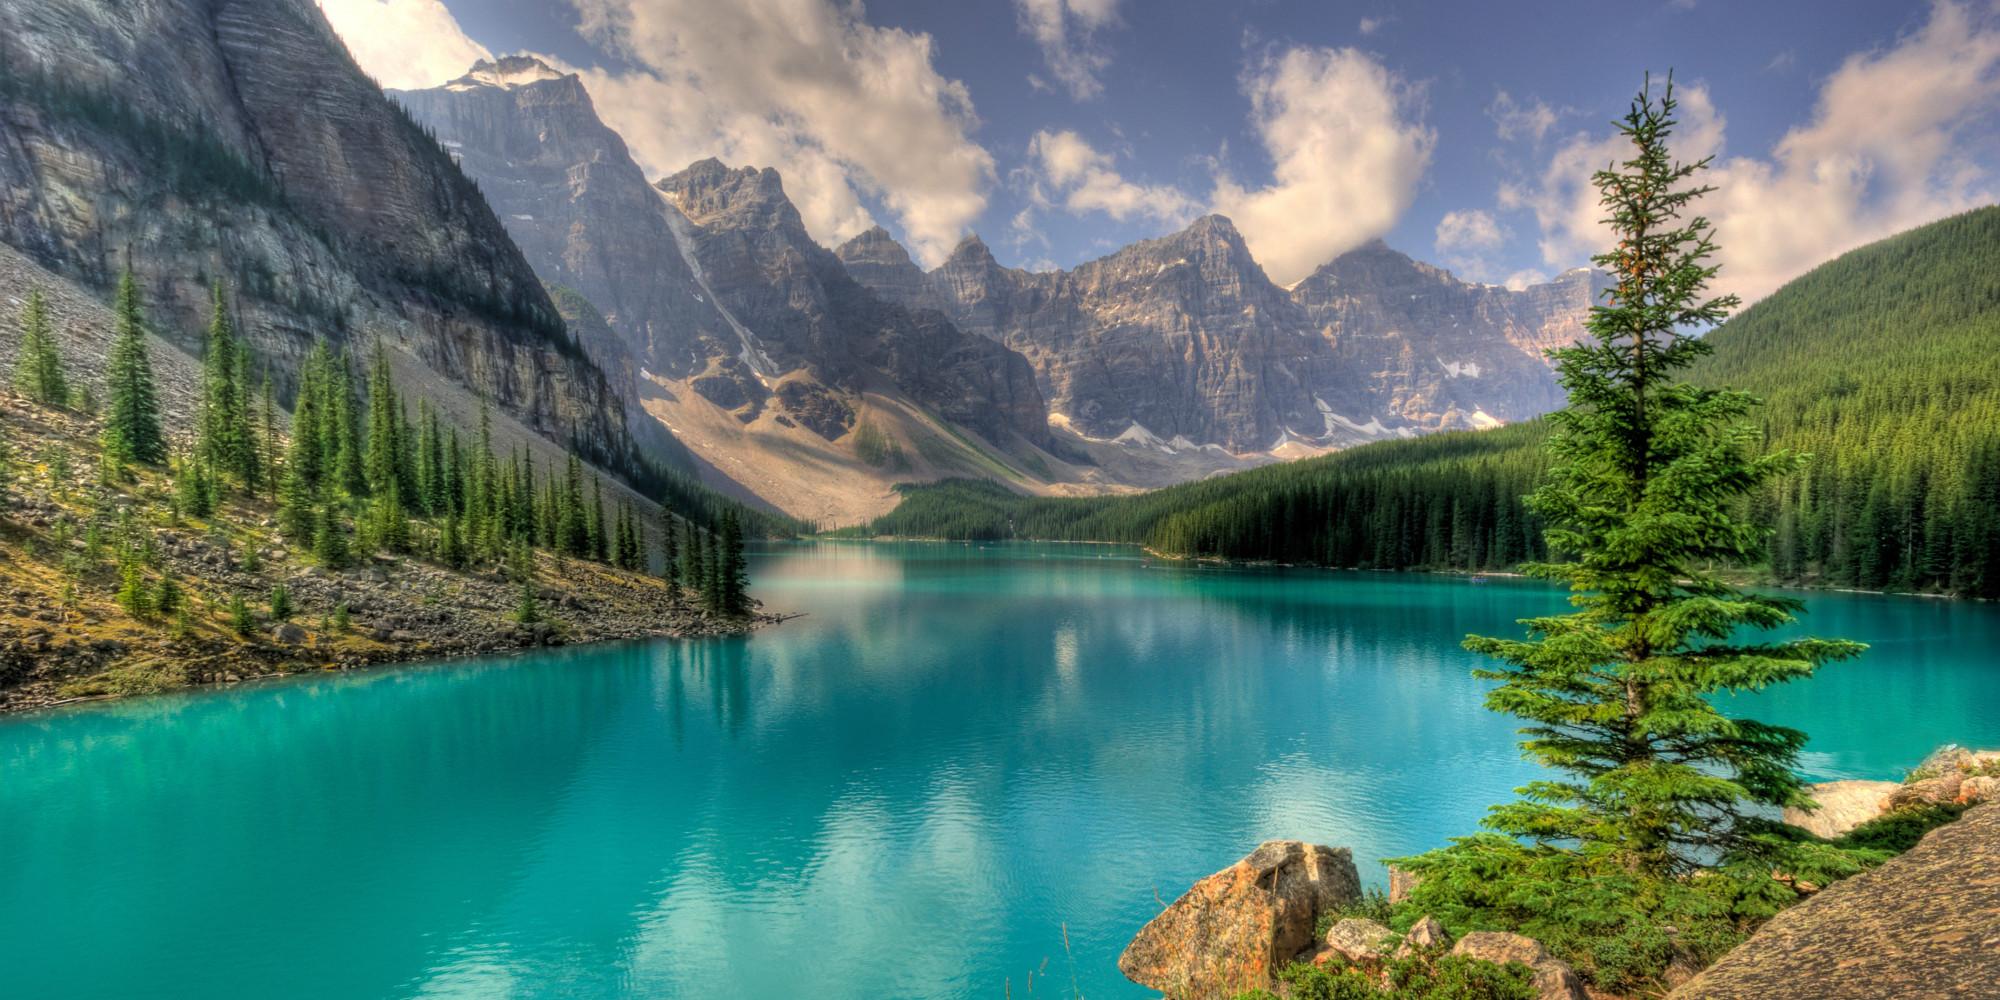 Colorado Fall Desktop Wallpaper 5 Reasons To Visit Banff National Park This Fall